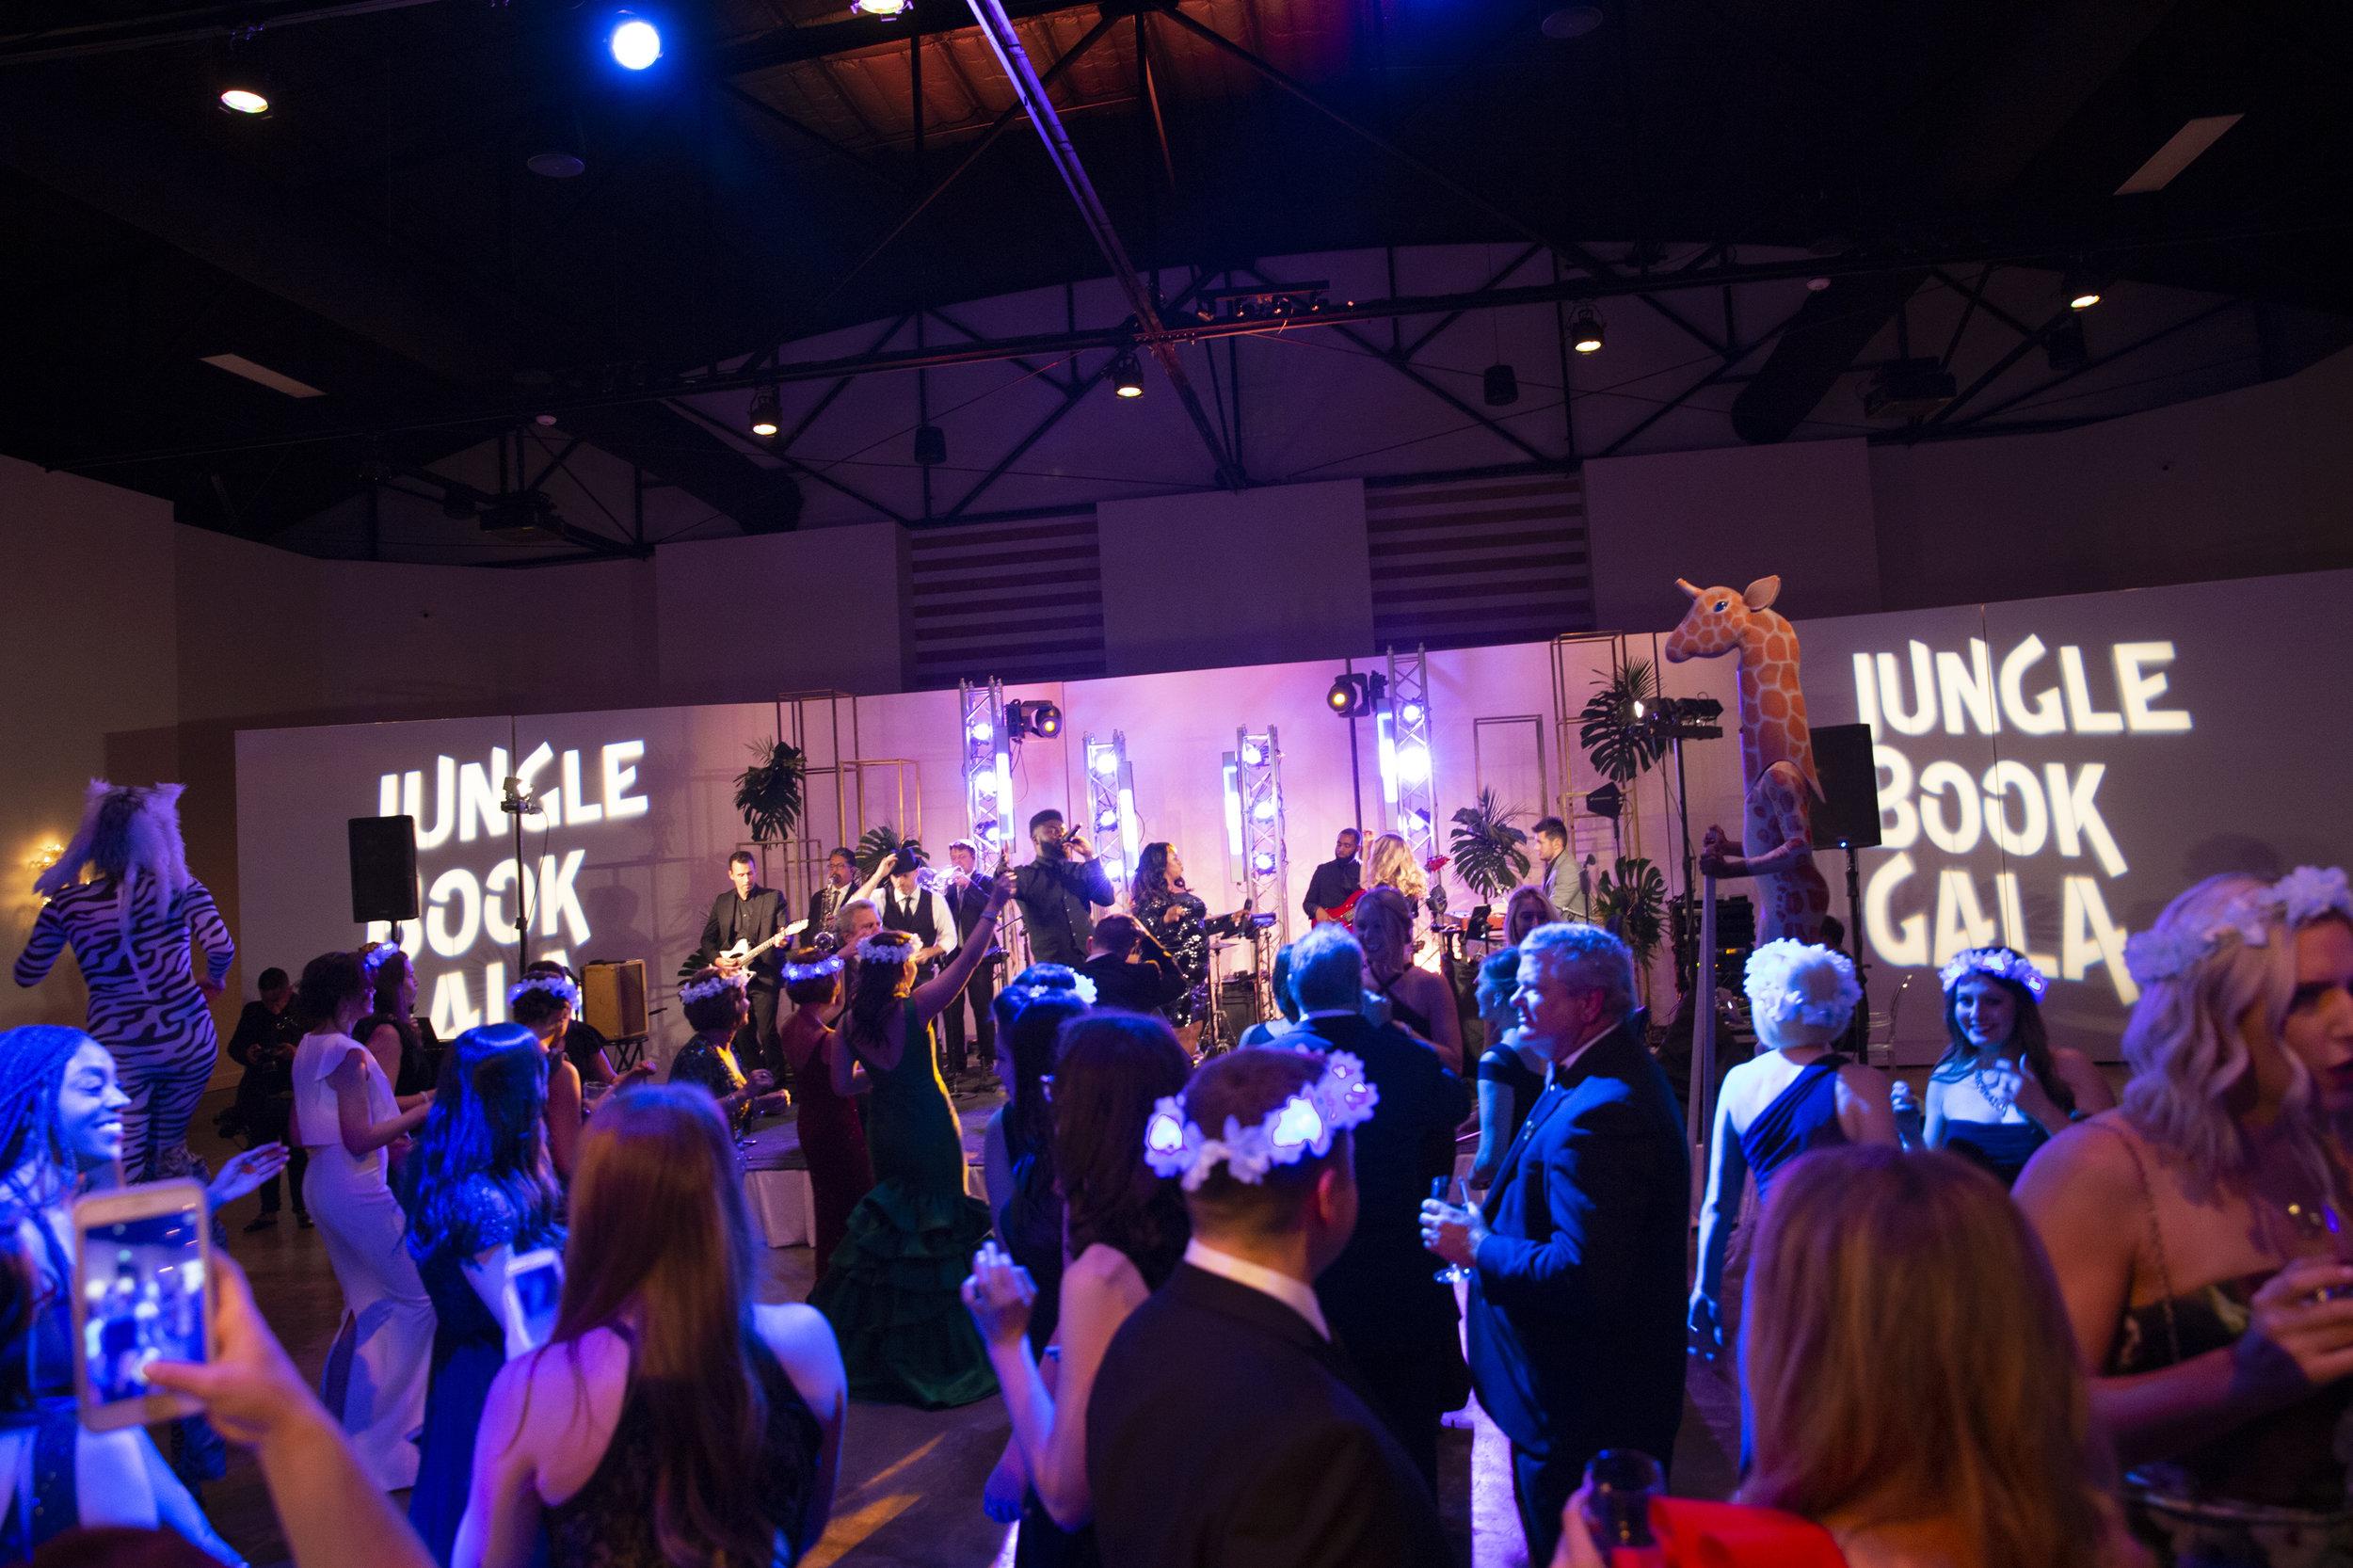 2018 Jungle Book Gala; Photo by Jenny Antill.jpg